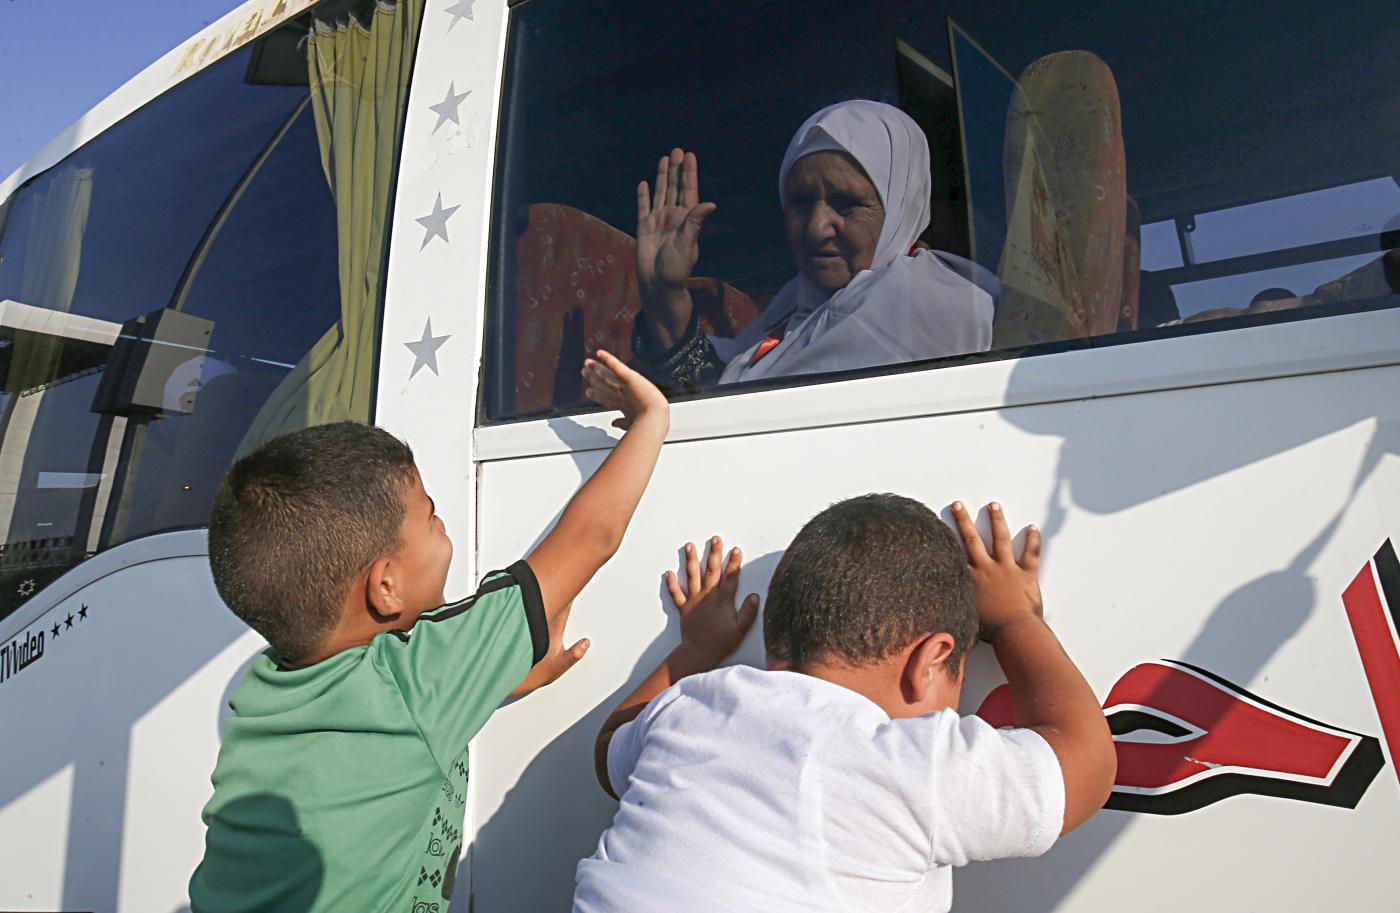 REVEALED: How Saudi Arabia has blocked Palestinians fleeing Syria's war from Hajj